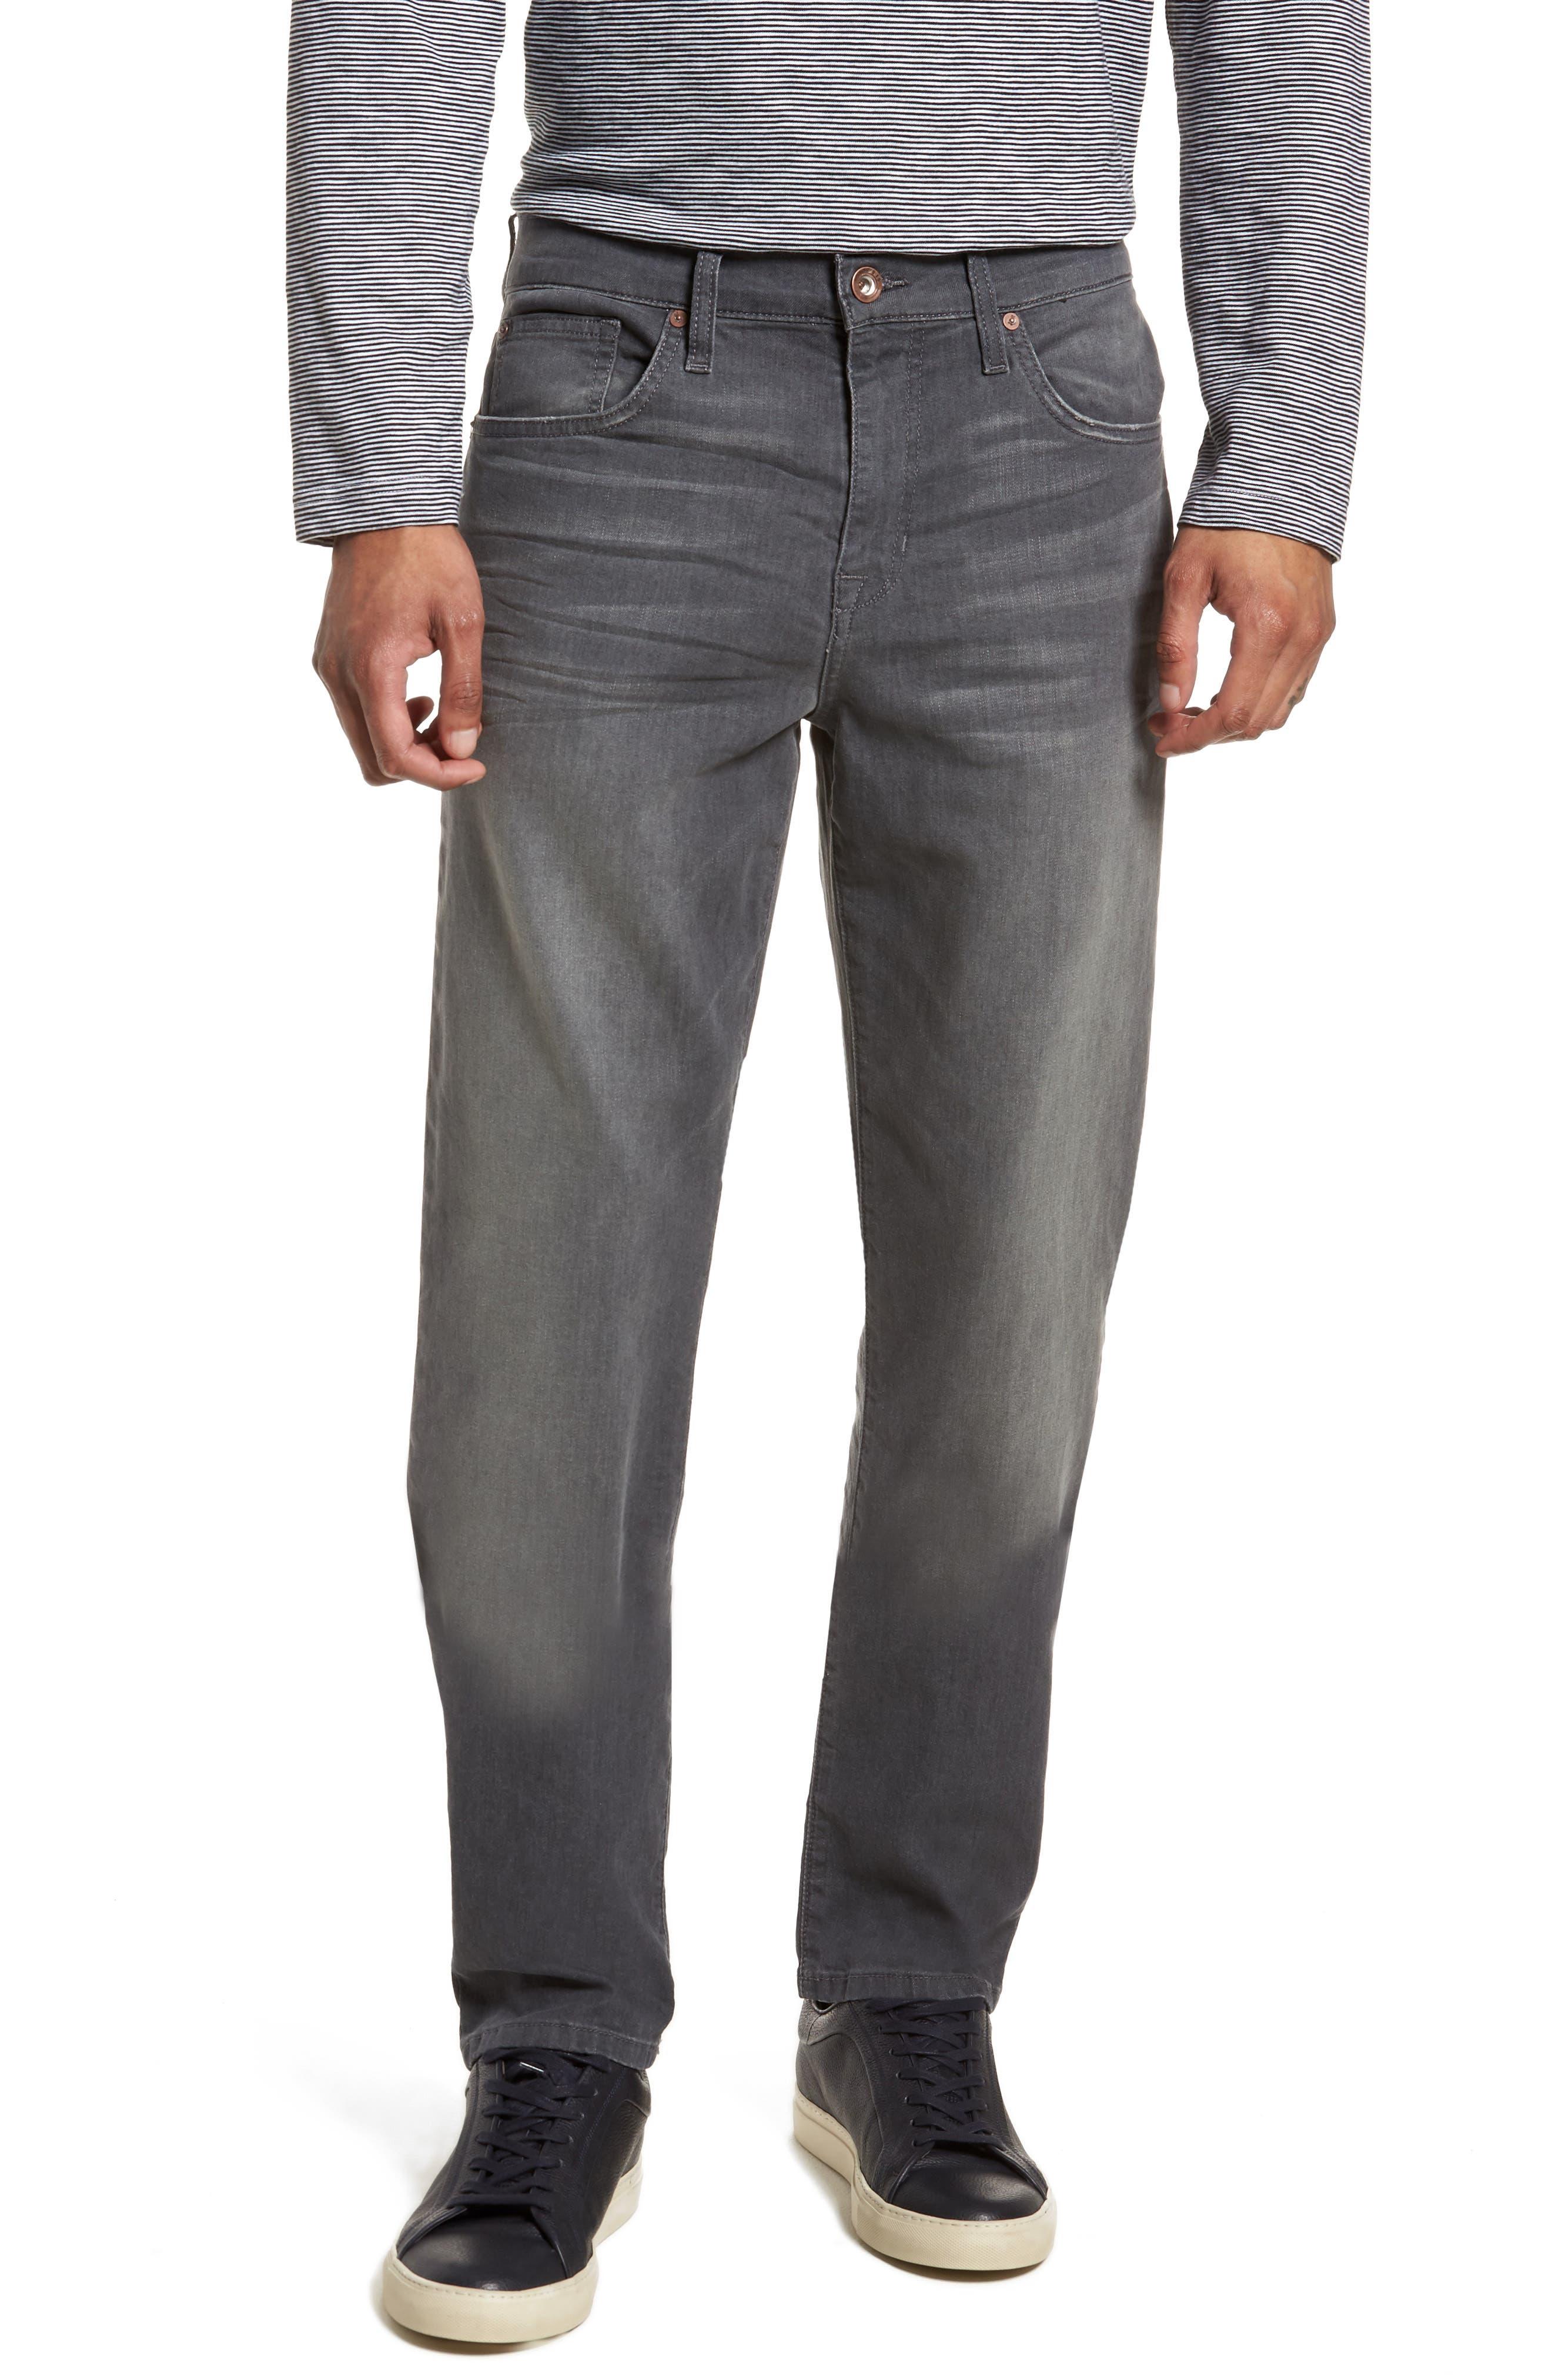 Folsom Athletic Slim Fit Jeans,                             Main thumbnail 1, color,                             Julian